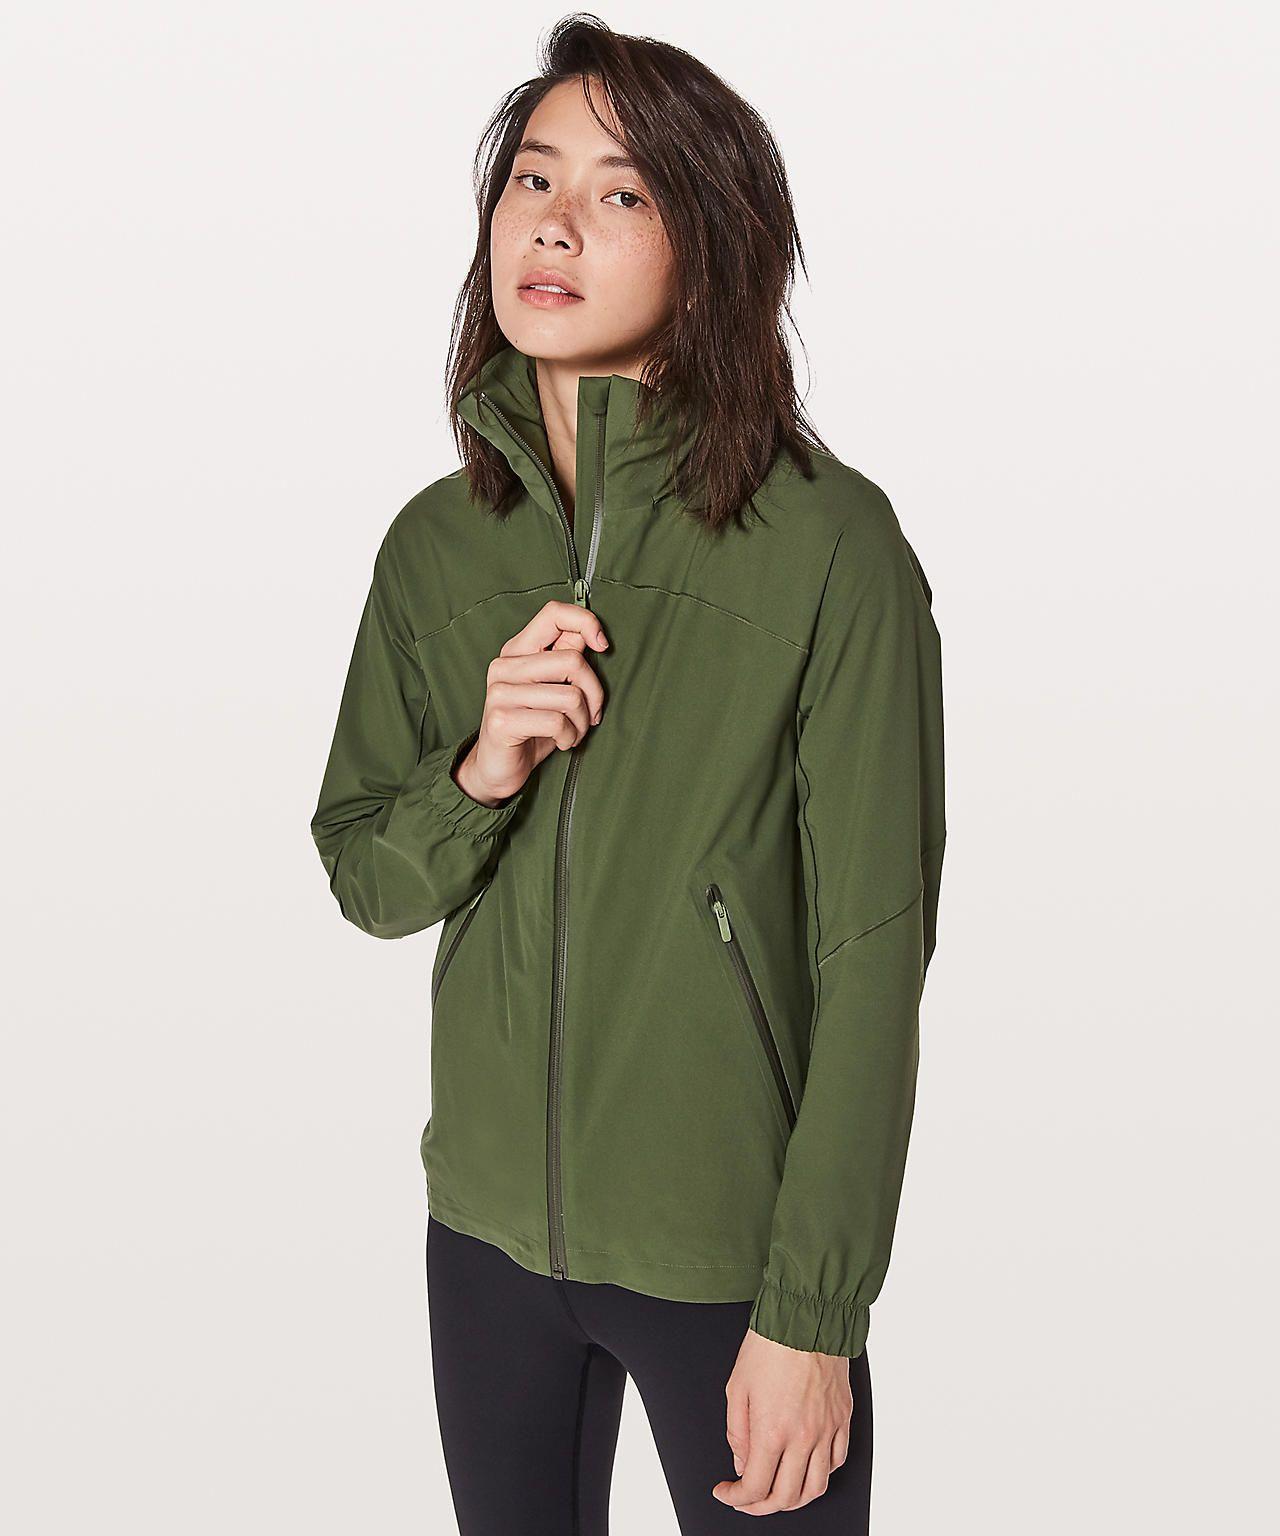 Lululemon Here To Move Jacket Jackets Jackets For Women Waterproof Jacket [ 1536 x 1280 Pixel ]